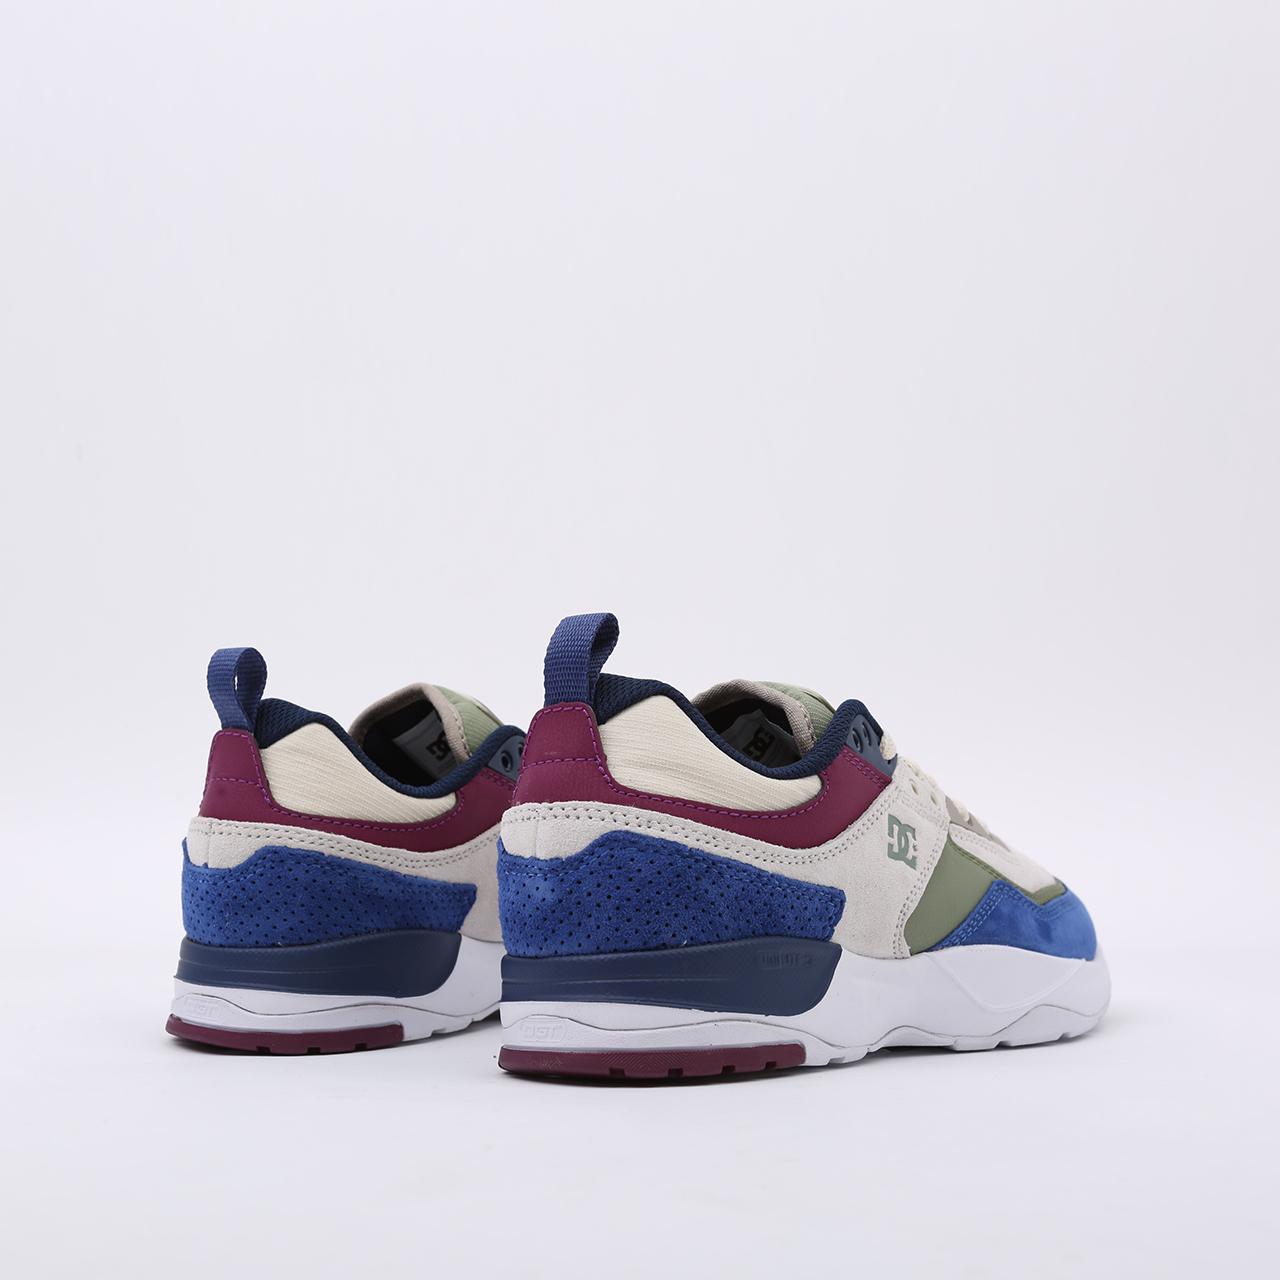 мужские разноцветные  кроссовки dc shoes e. tribeka se ADYS700142-xbwg-xbwg - цена, описание, фото 3